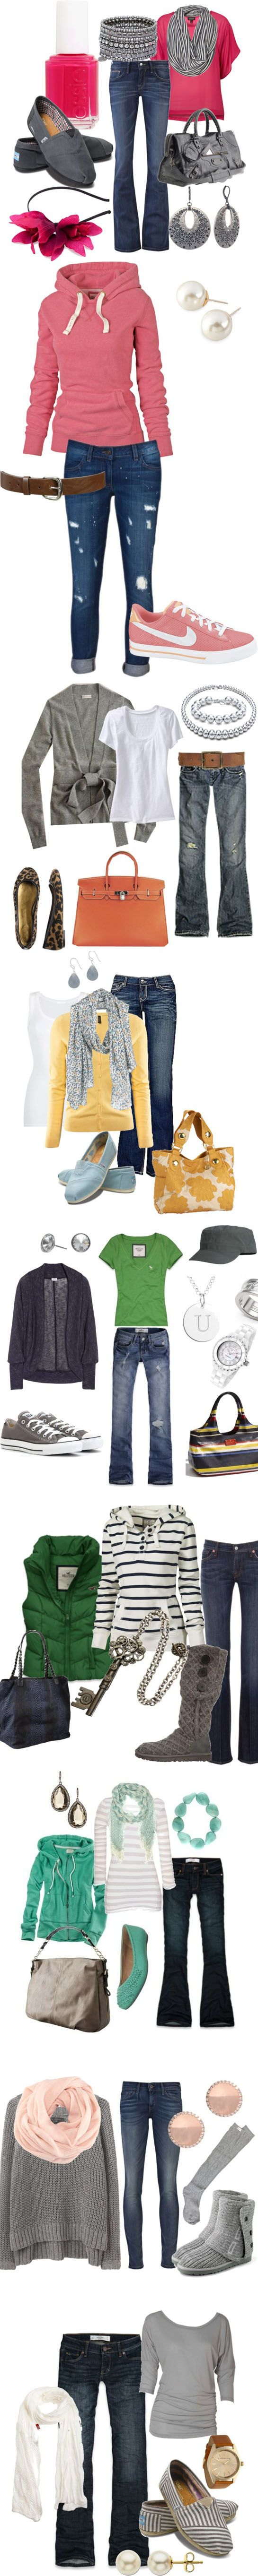 26 Fall Fashions #fashion #style